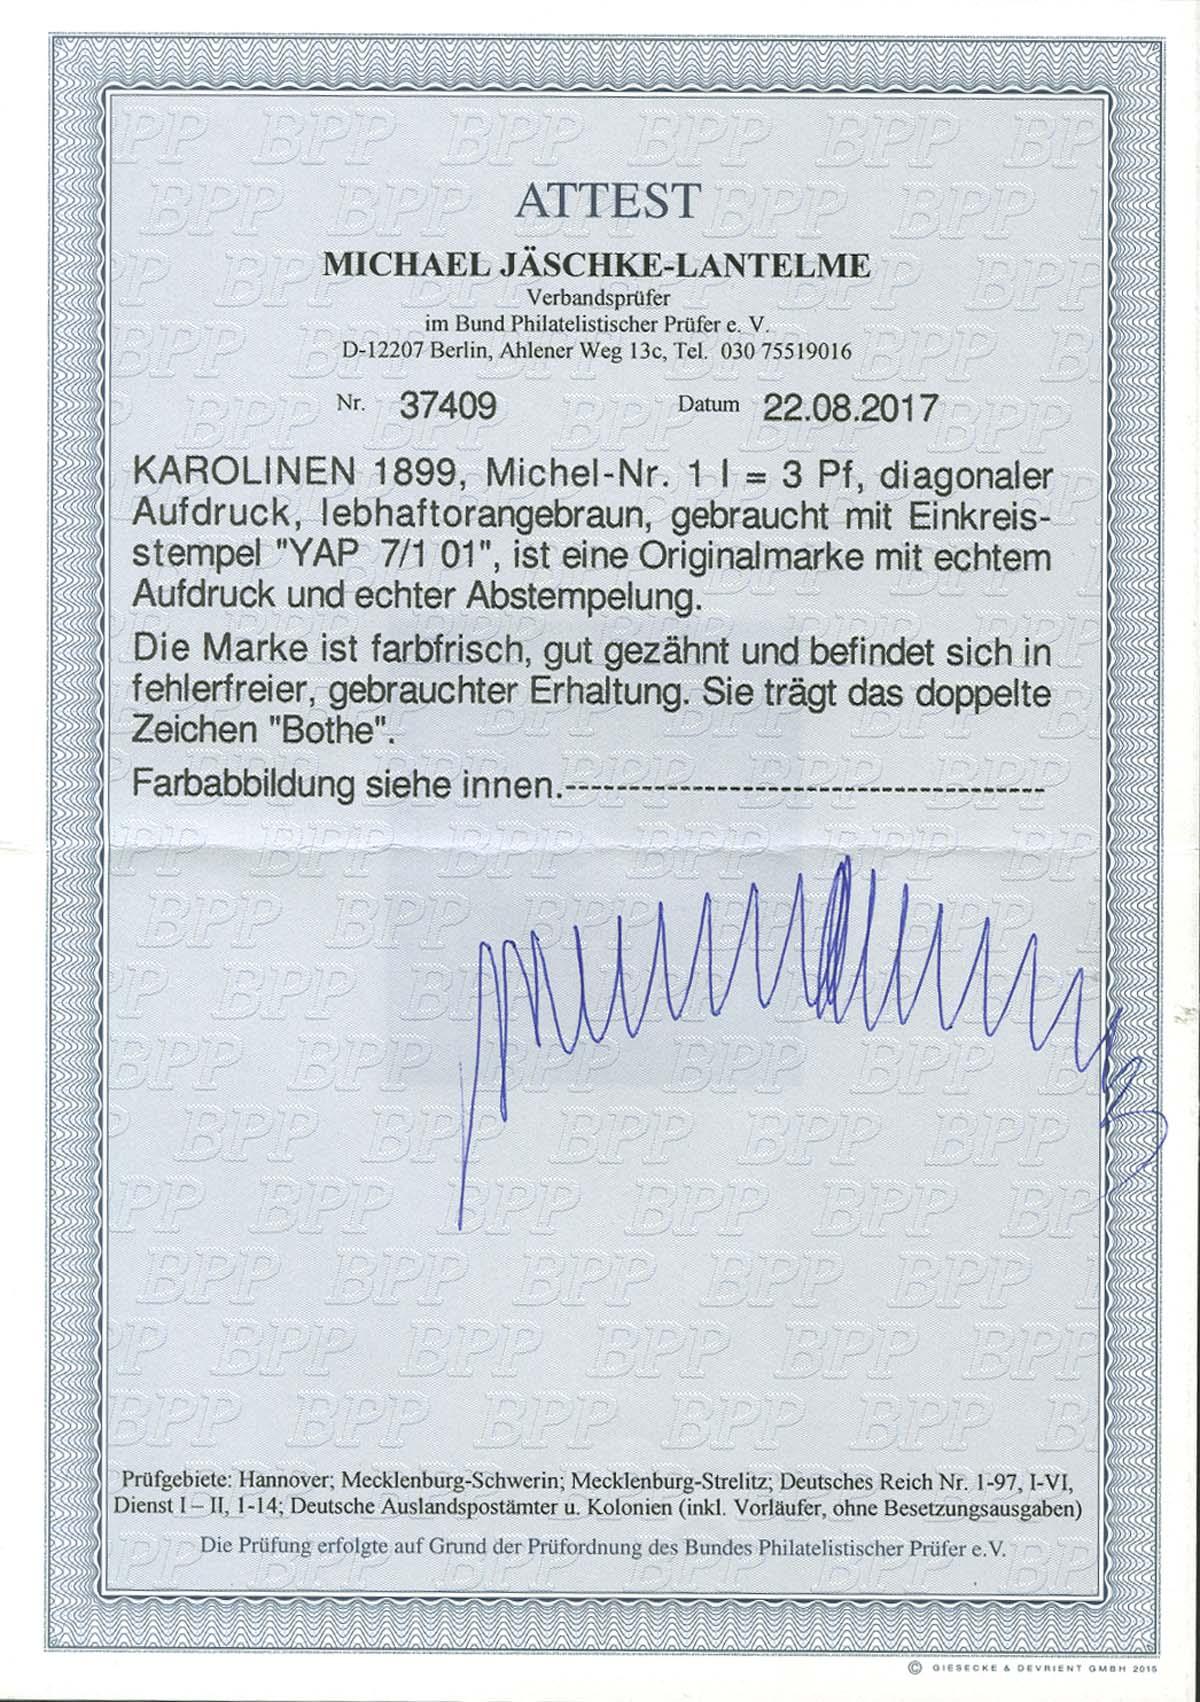 Lot 4492 - Auslandspostämter & Kolonien_Karolinen_Markenausgaben  -  Auktionshaus Ulrich Felzmann GmbH & Co. KG Auction 170 International Autumn Auction 2020 Day 4